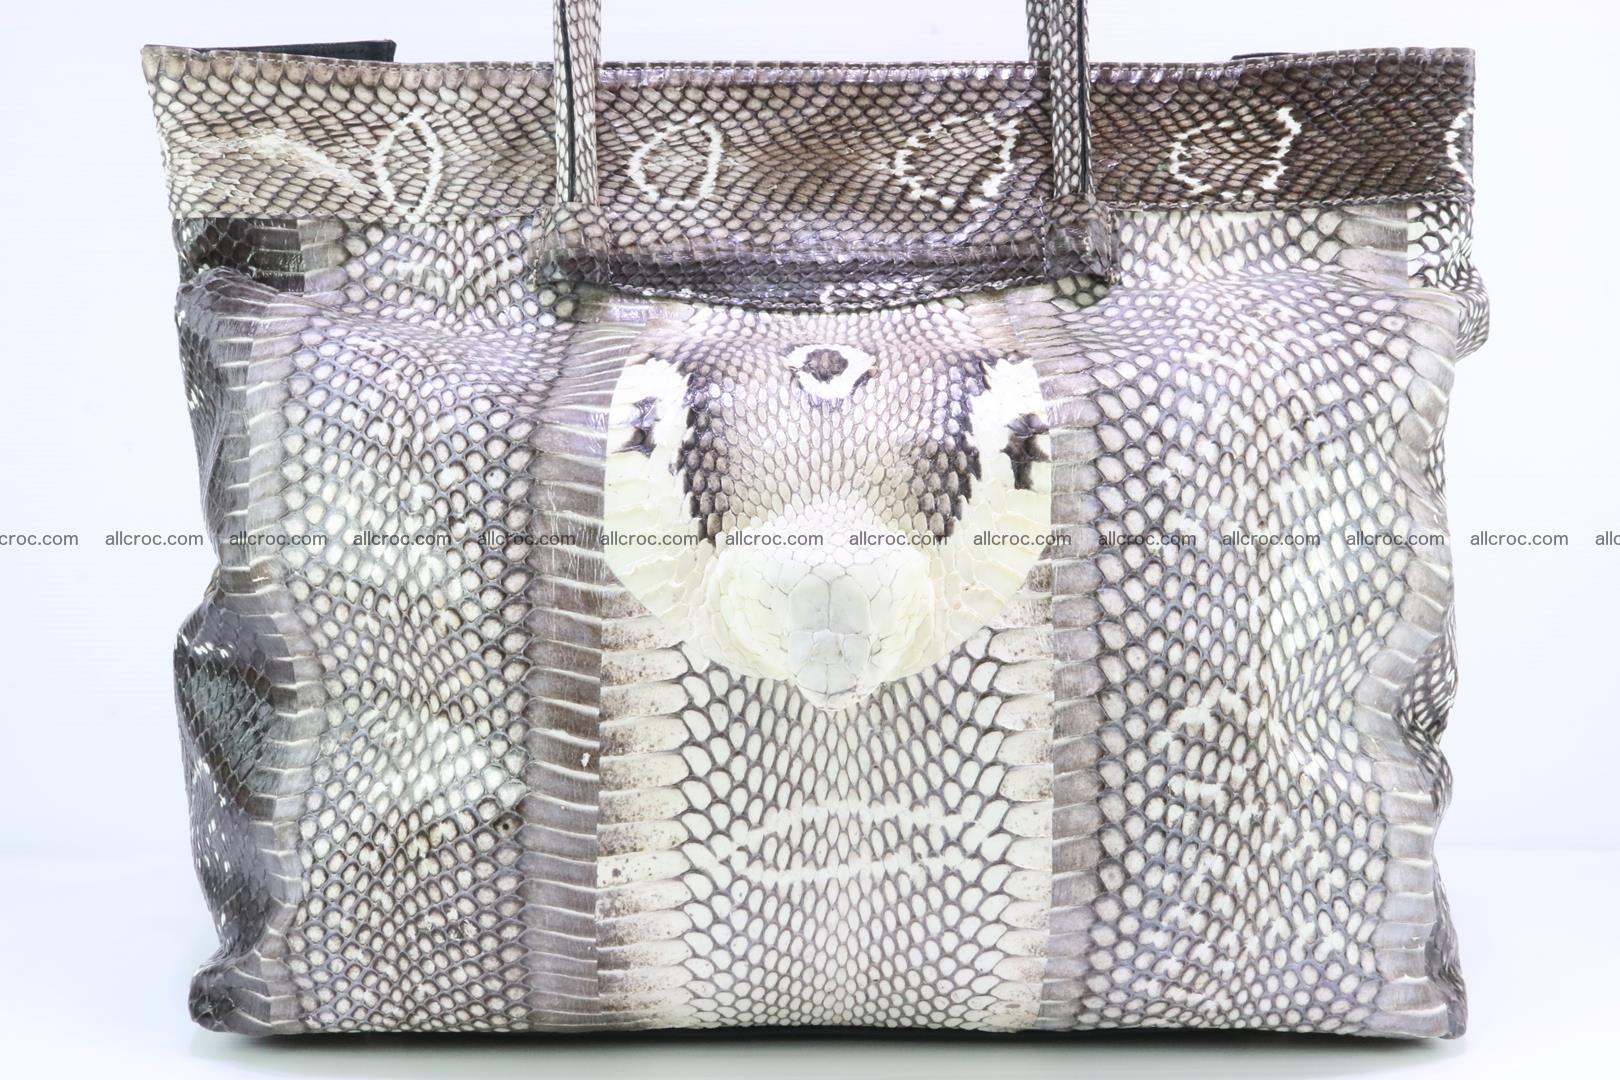 Handbag from cobra skin for lady 183 Foto 8